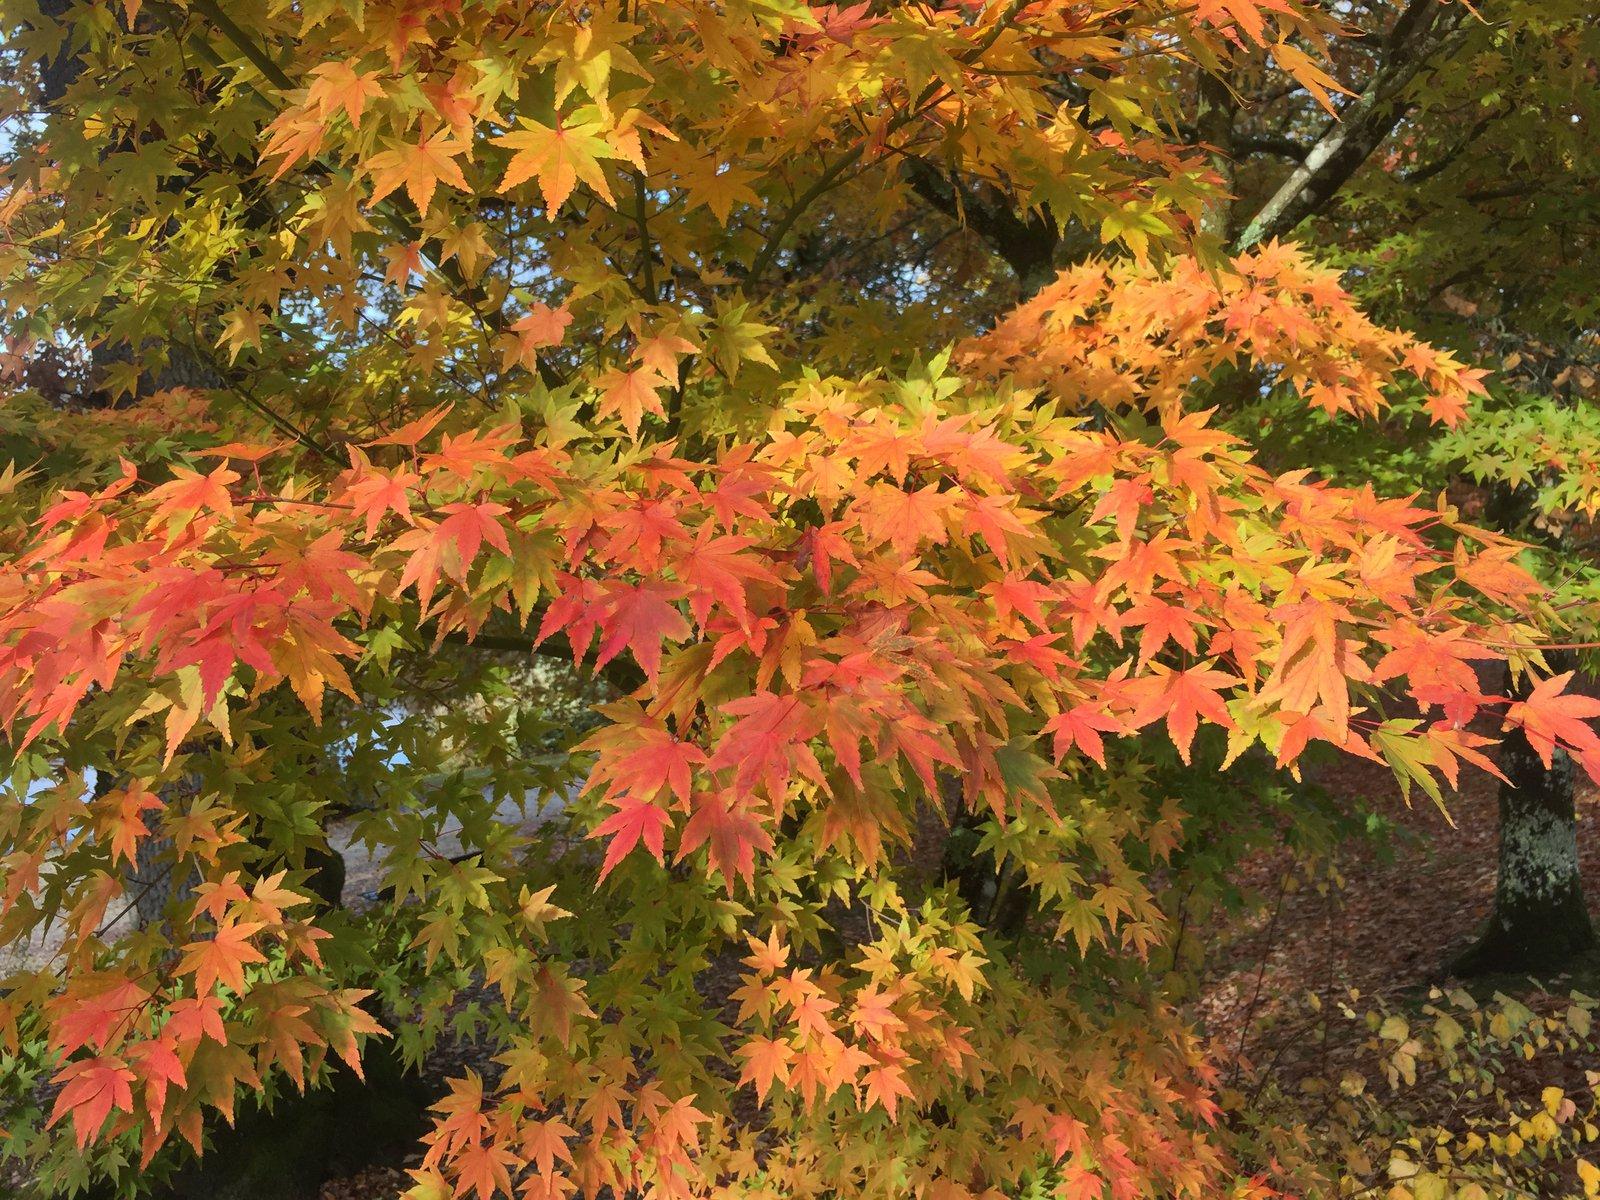 Image of Autumnal tree scene